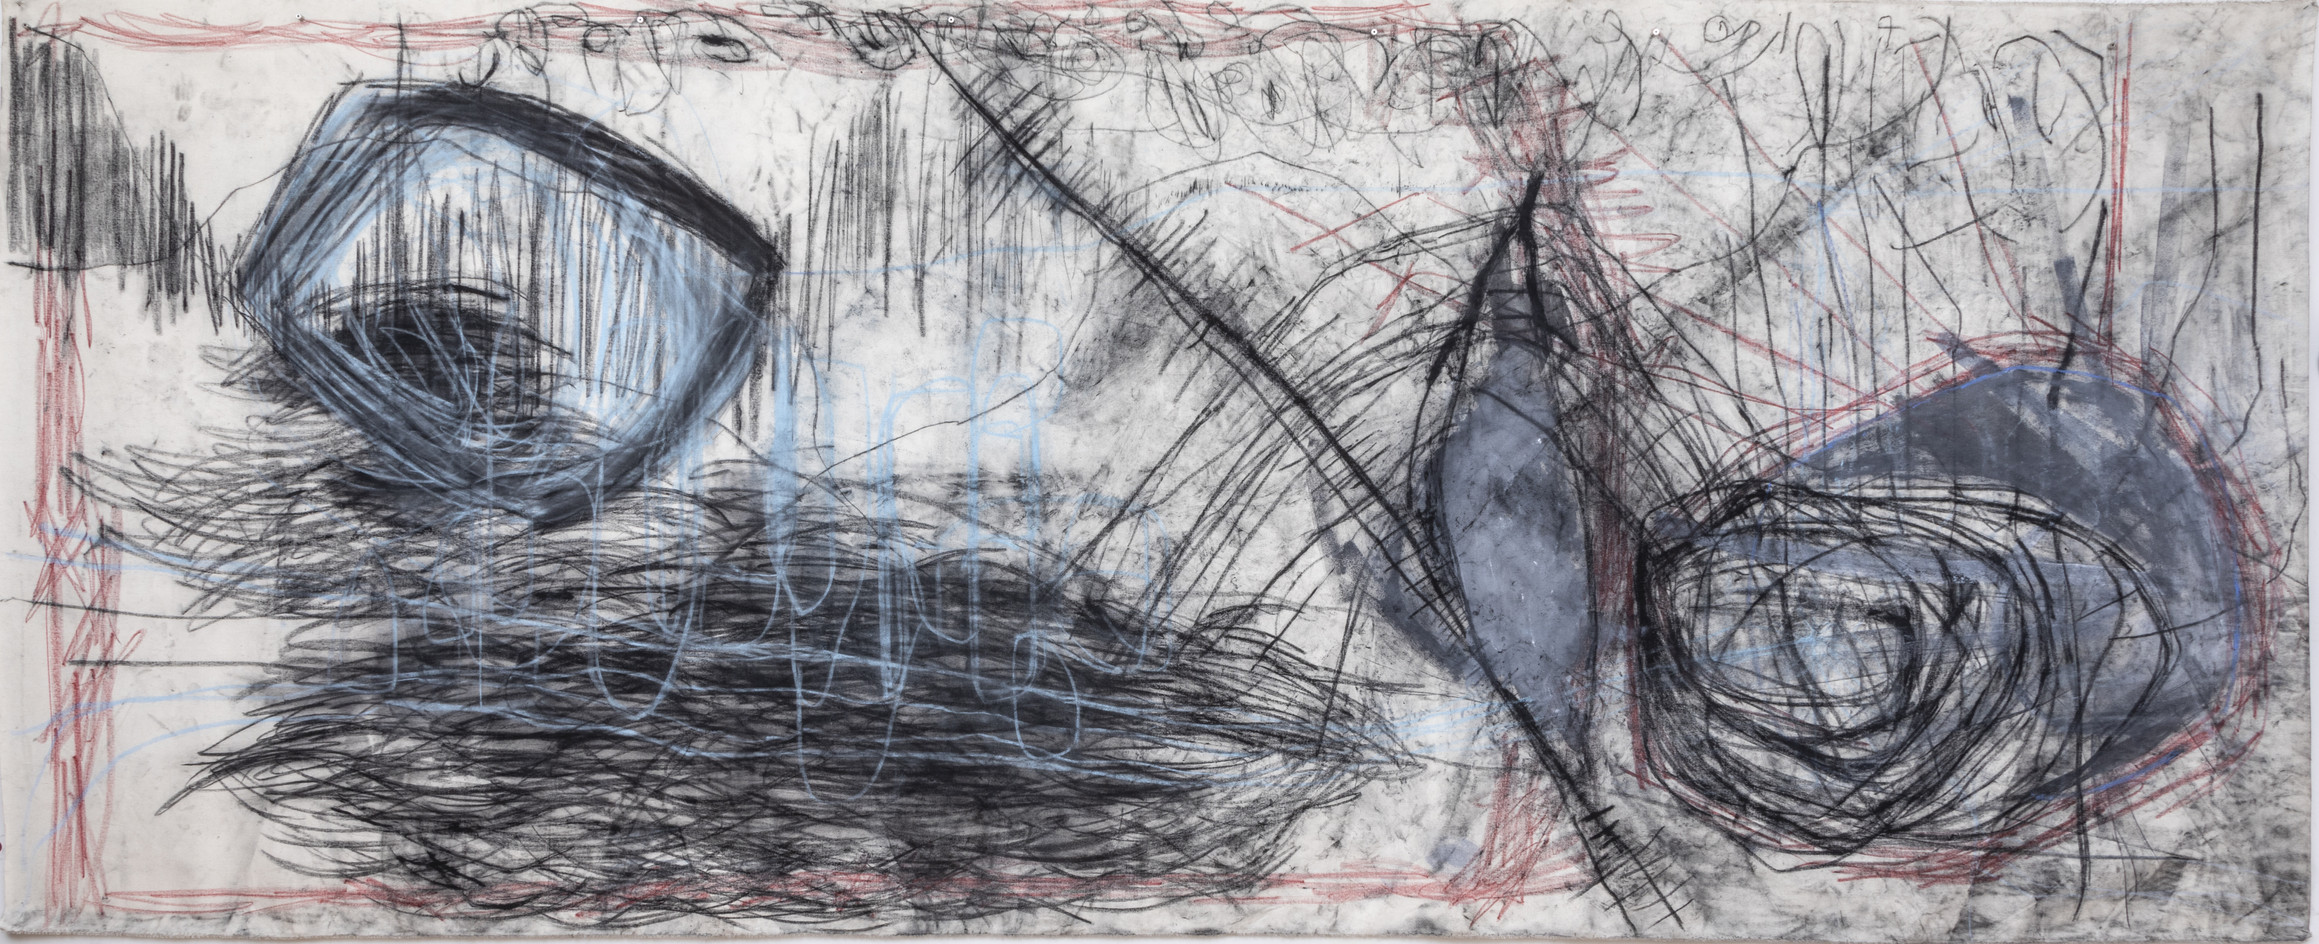 170 x 400 cm giz pastel seco, tinta acrílica, giz de cera sobre lona foto: Ruy Teixeira